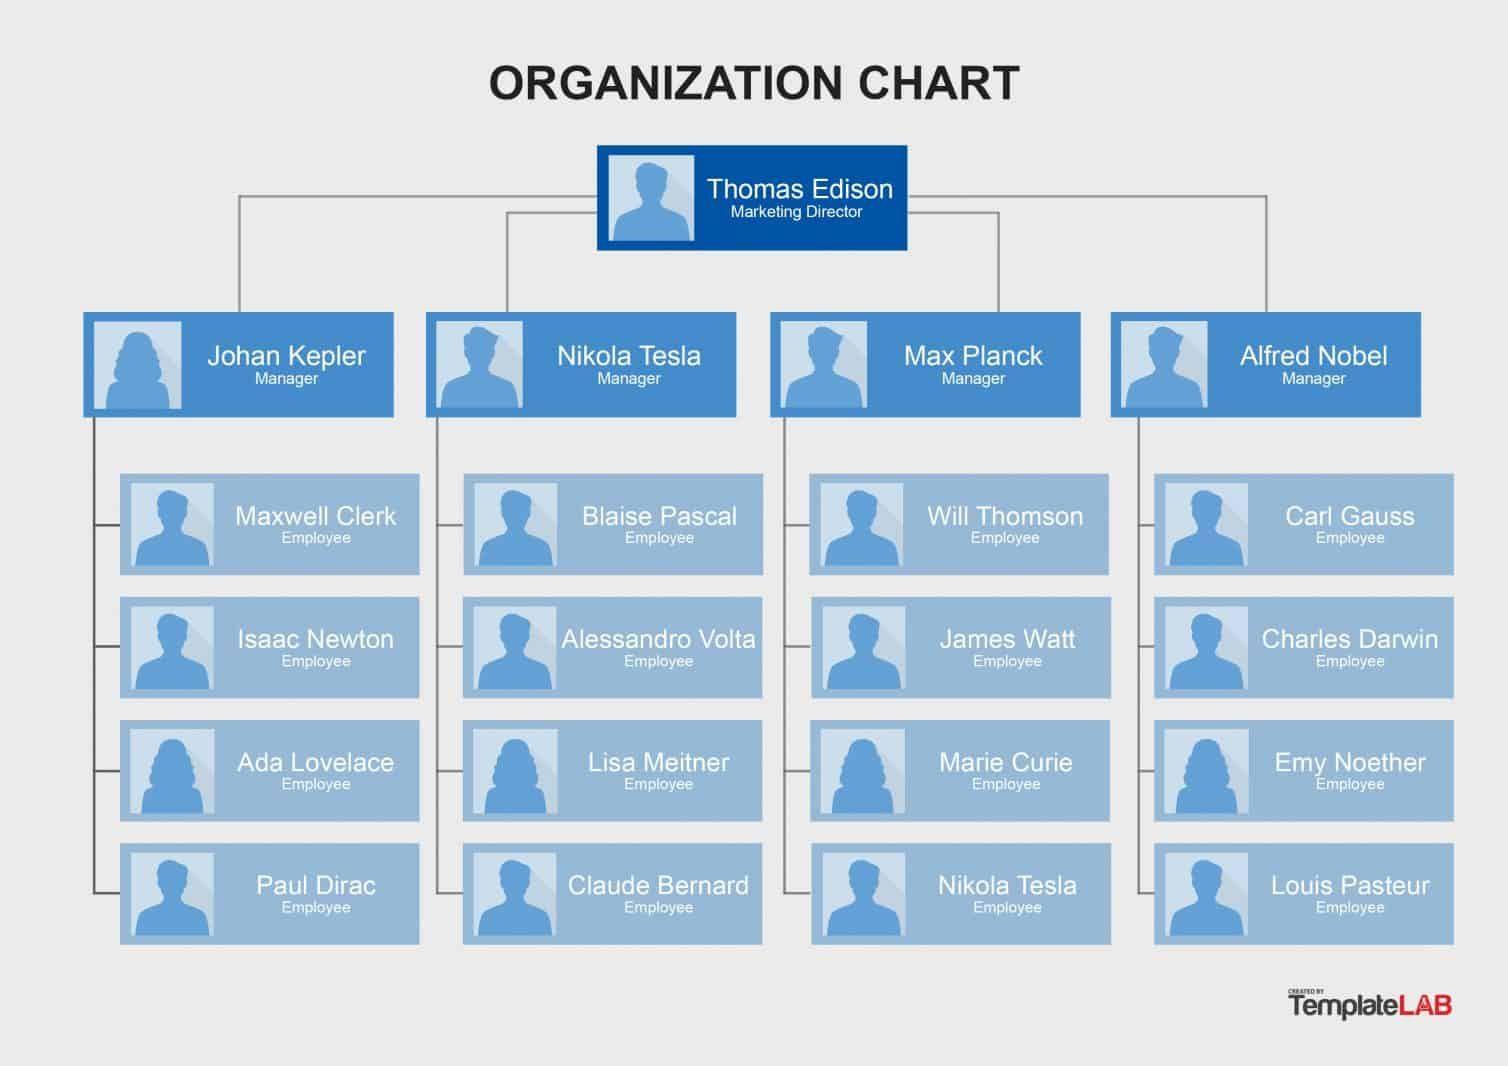 008 Marvelou Organization Chart Template Excel 2010 Example  Org OrganizationalFull